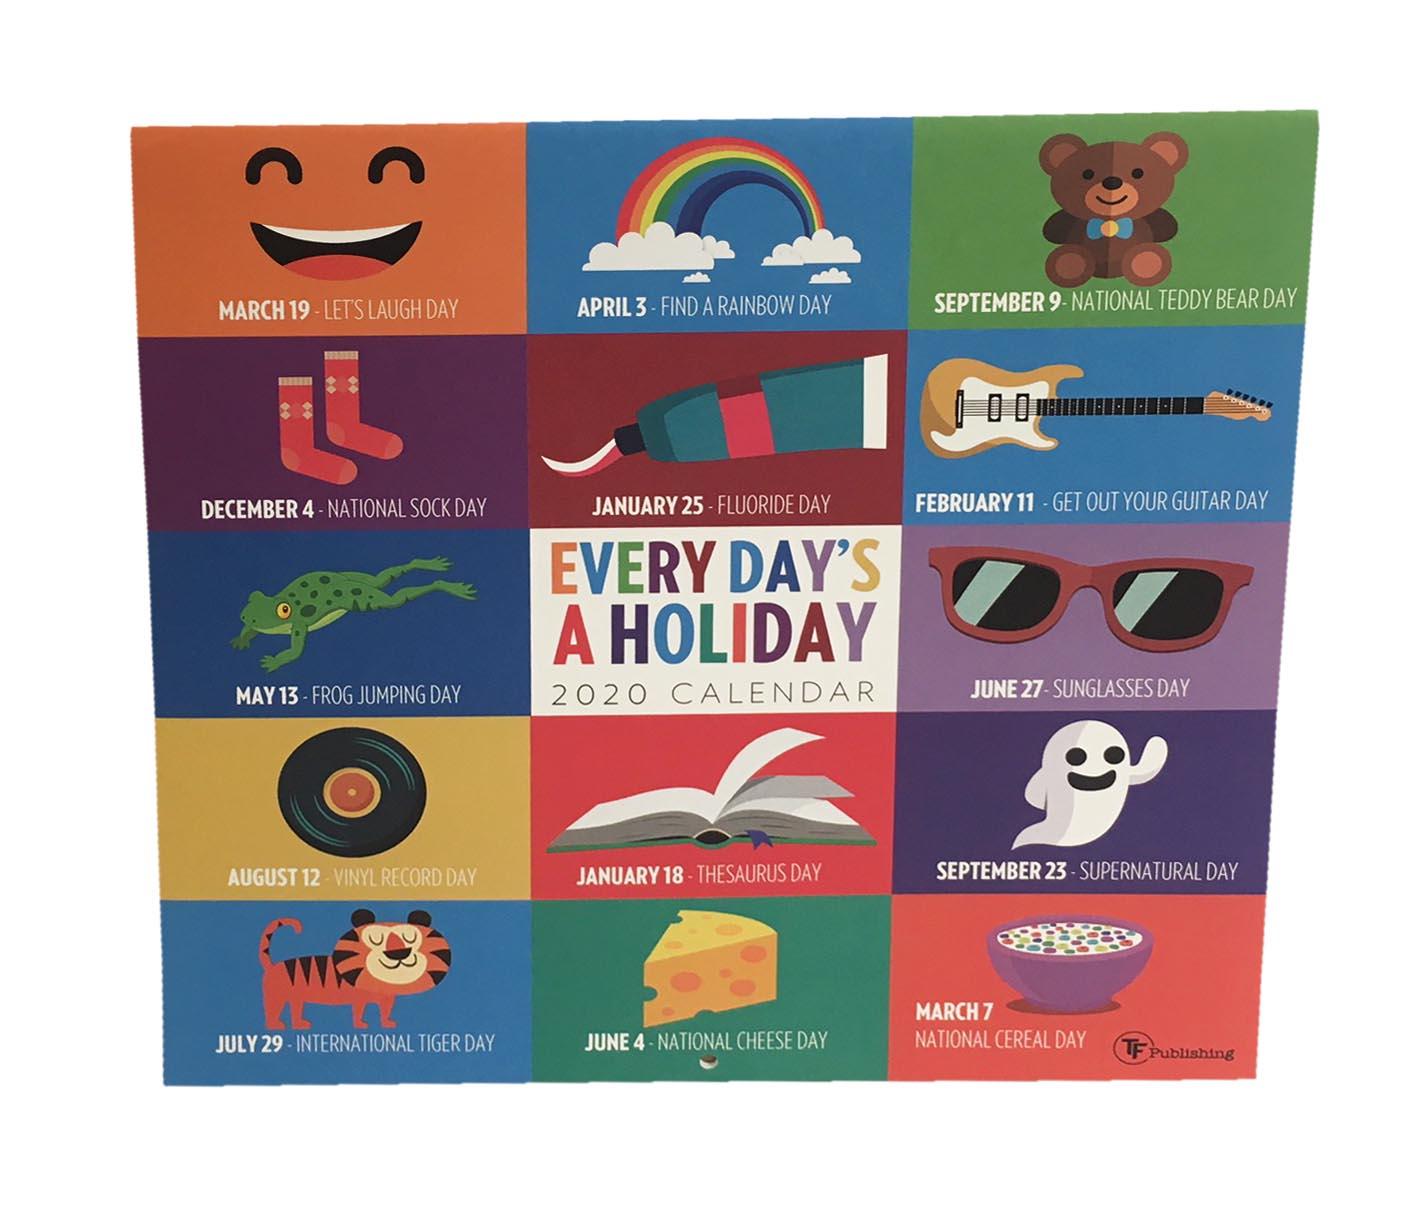 Every Day'S A Holiday Calendar Regarding Everydays A With Every Day A Holiday Calendar